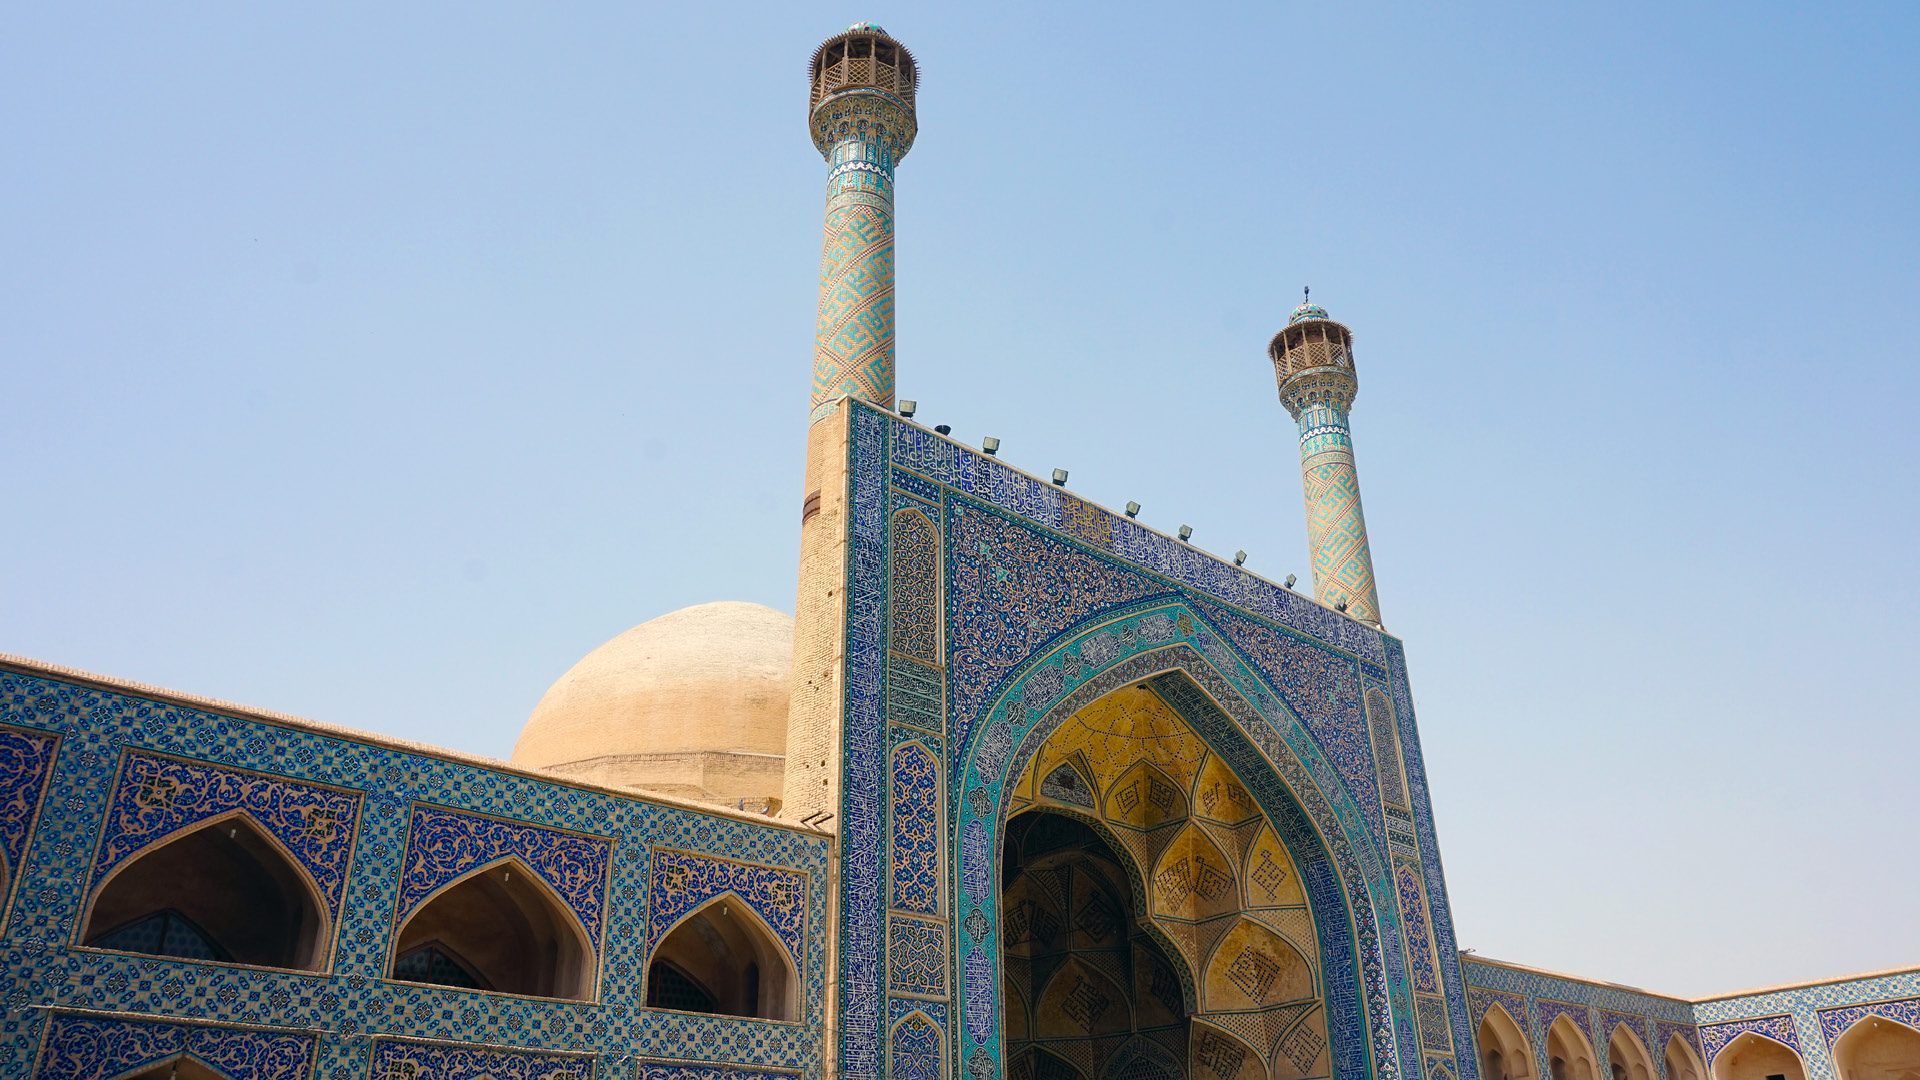 vrijdagmoskee isfahan